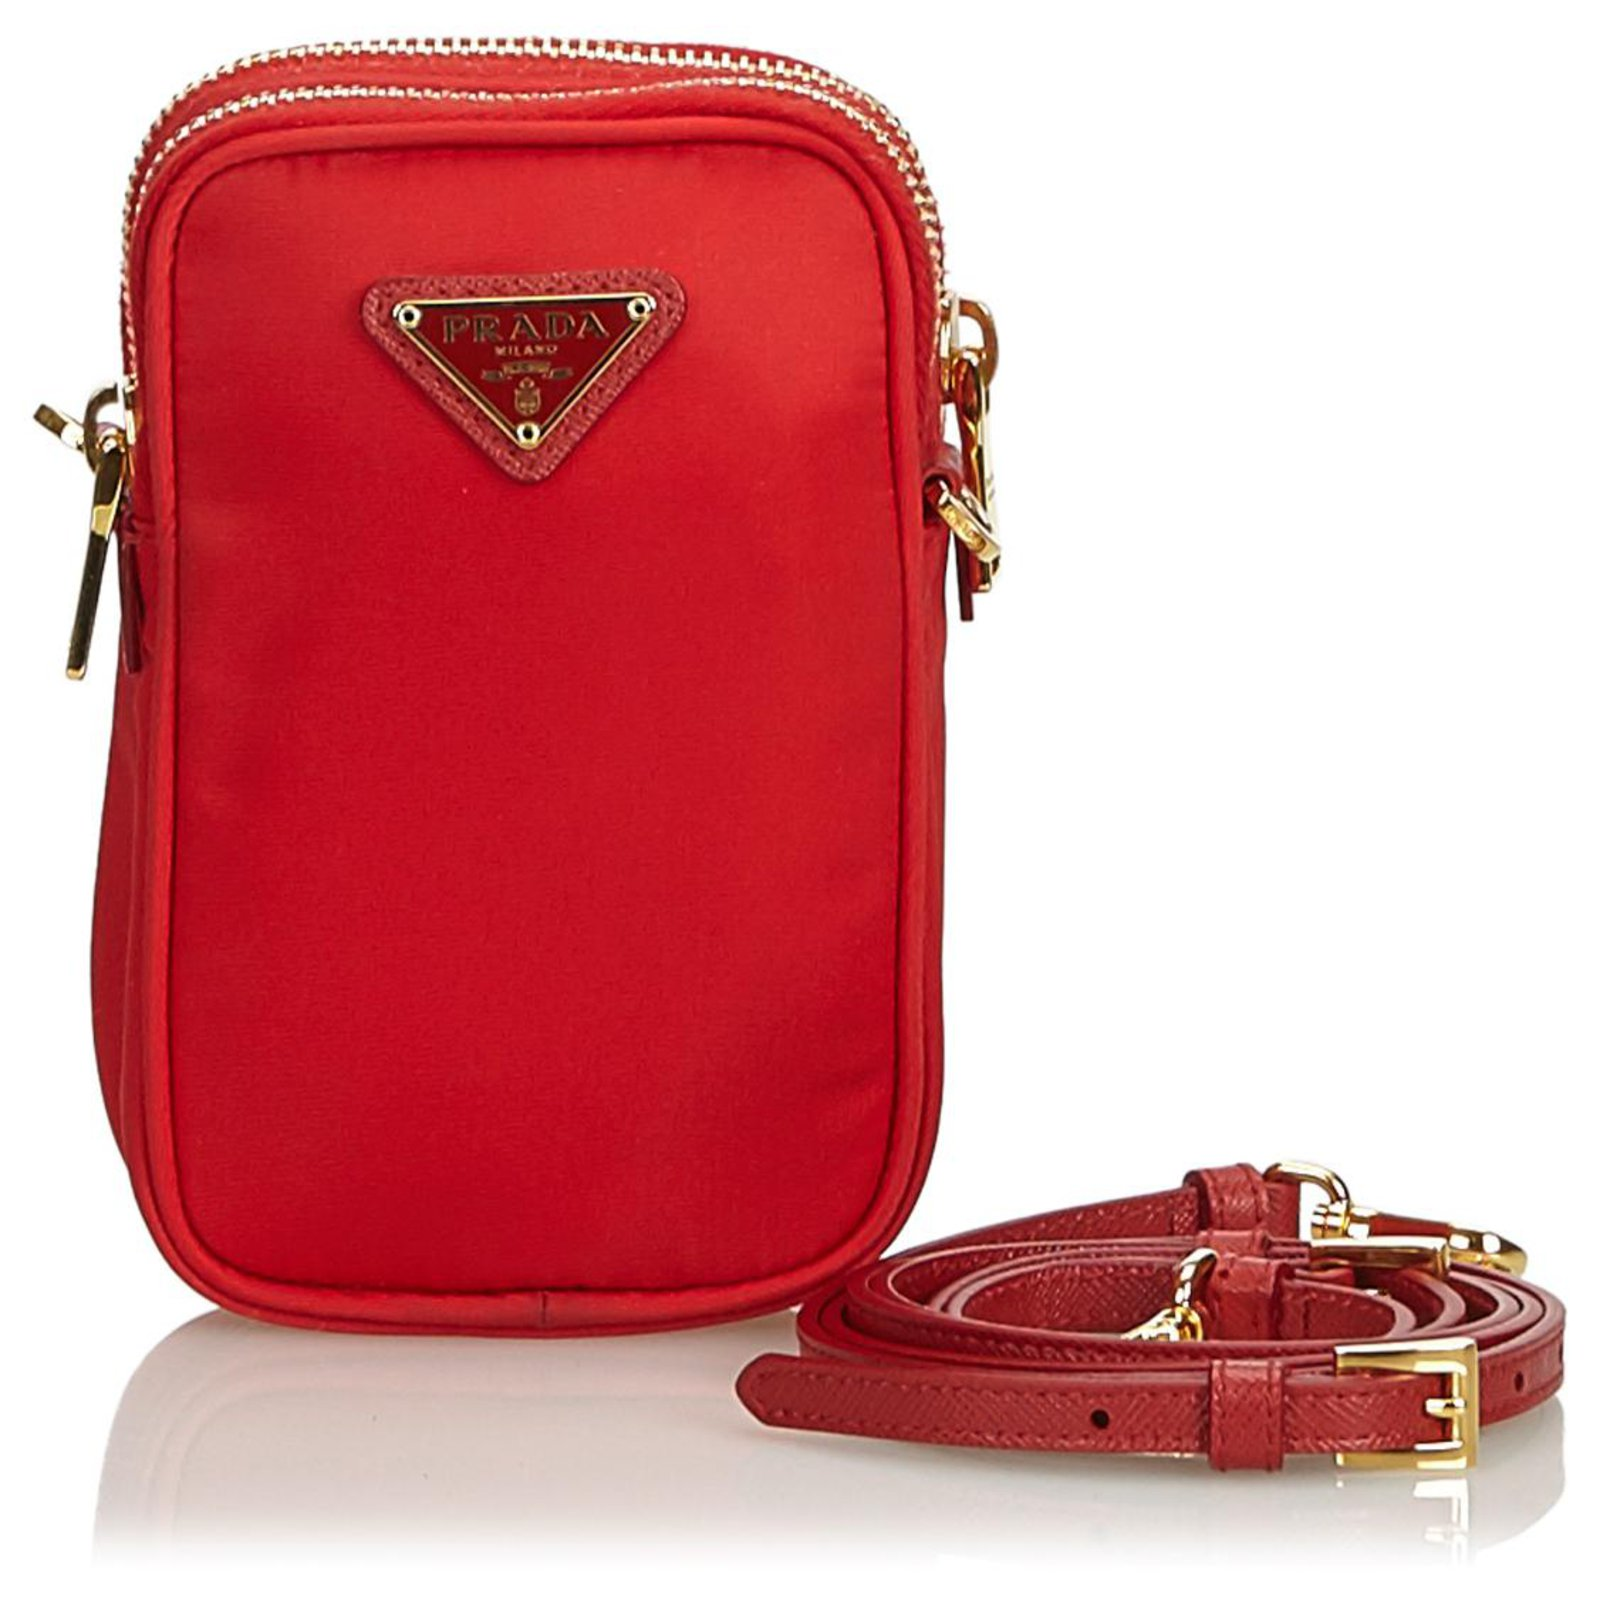 9bceca6a2901 Prada Prada Red Mini Nylon Crossbody Handbags Nylon,Cloth Red ref.122283